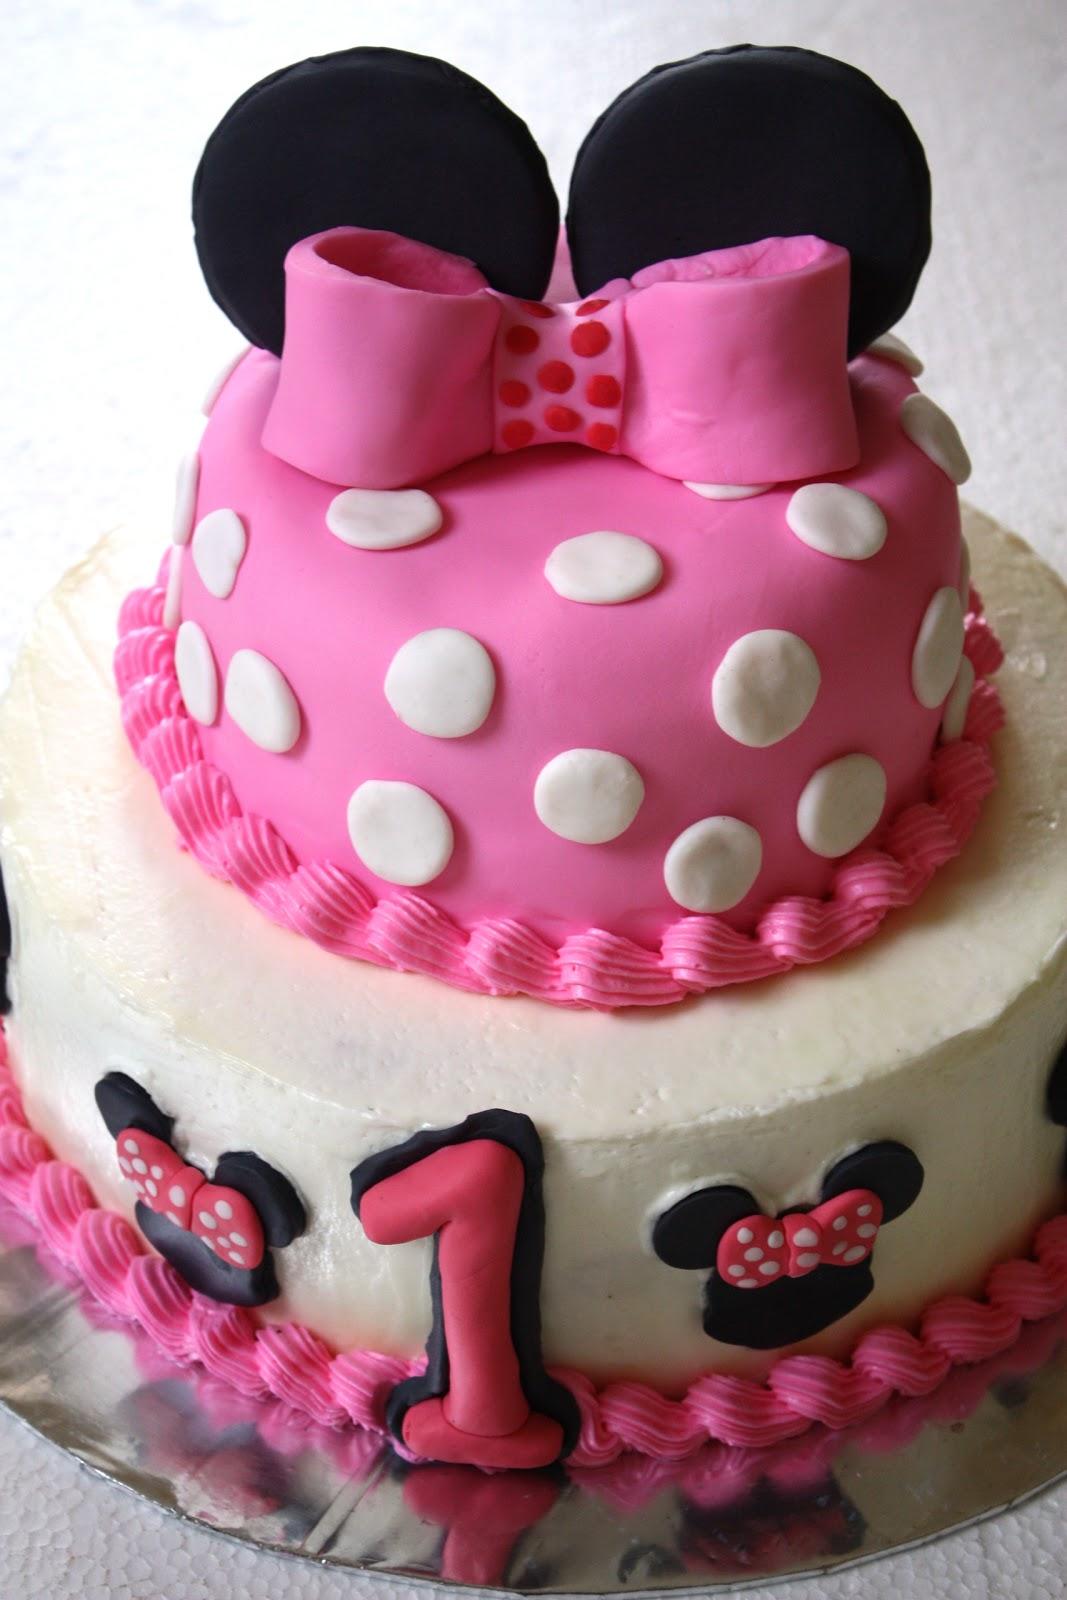 Gambar Kue Ulang Tahun Lucu Dan Cantik Gambar Viral Hd